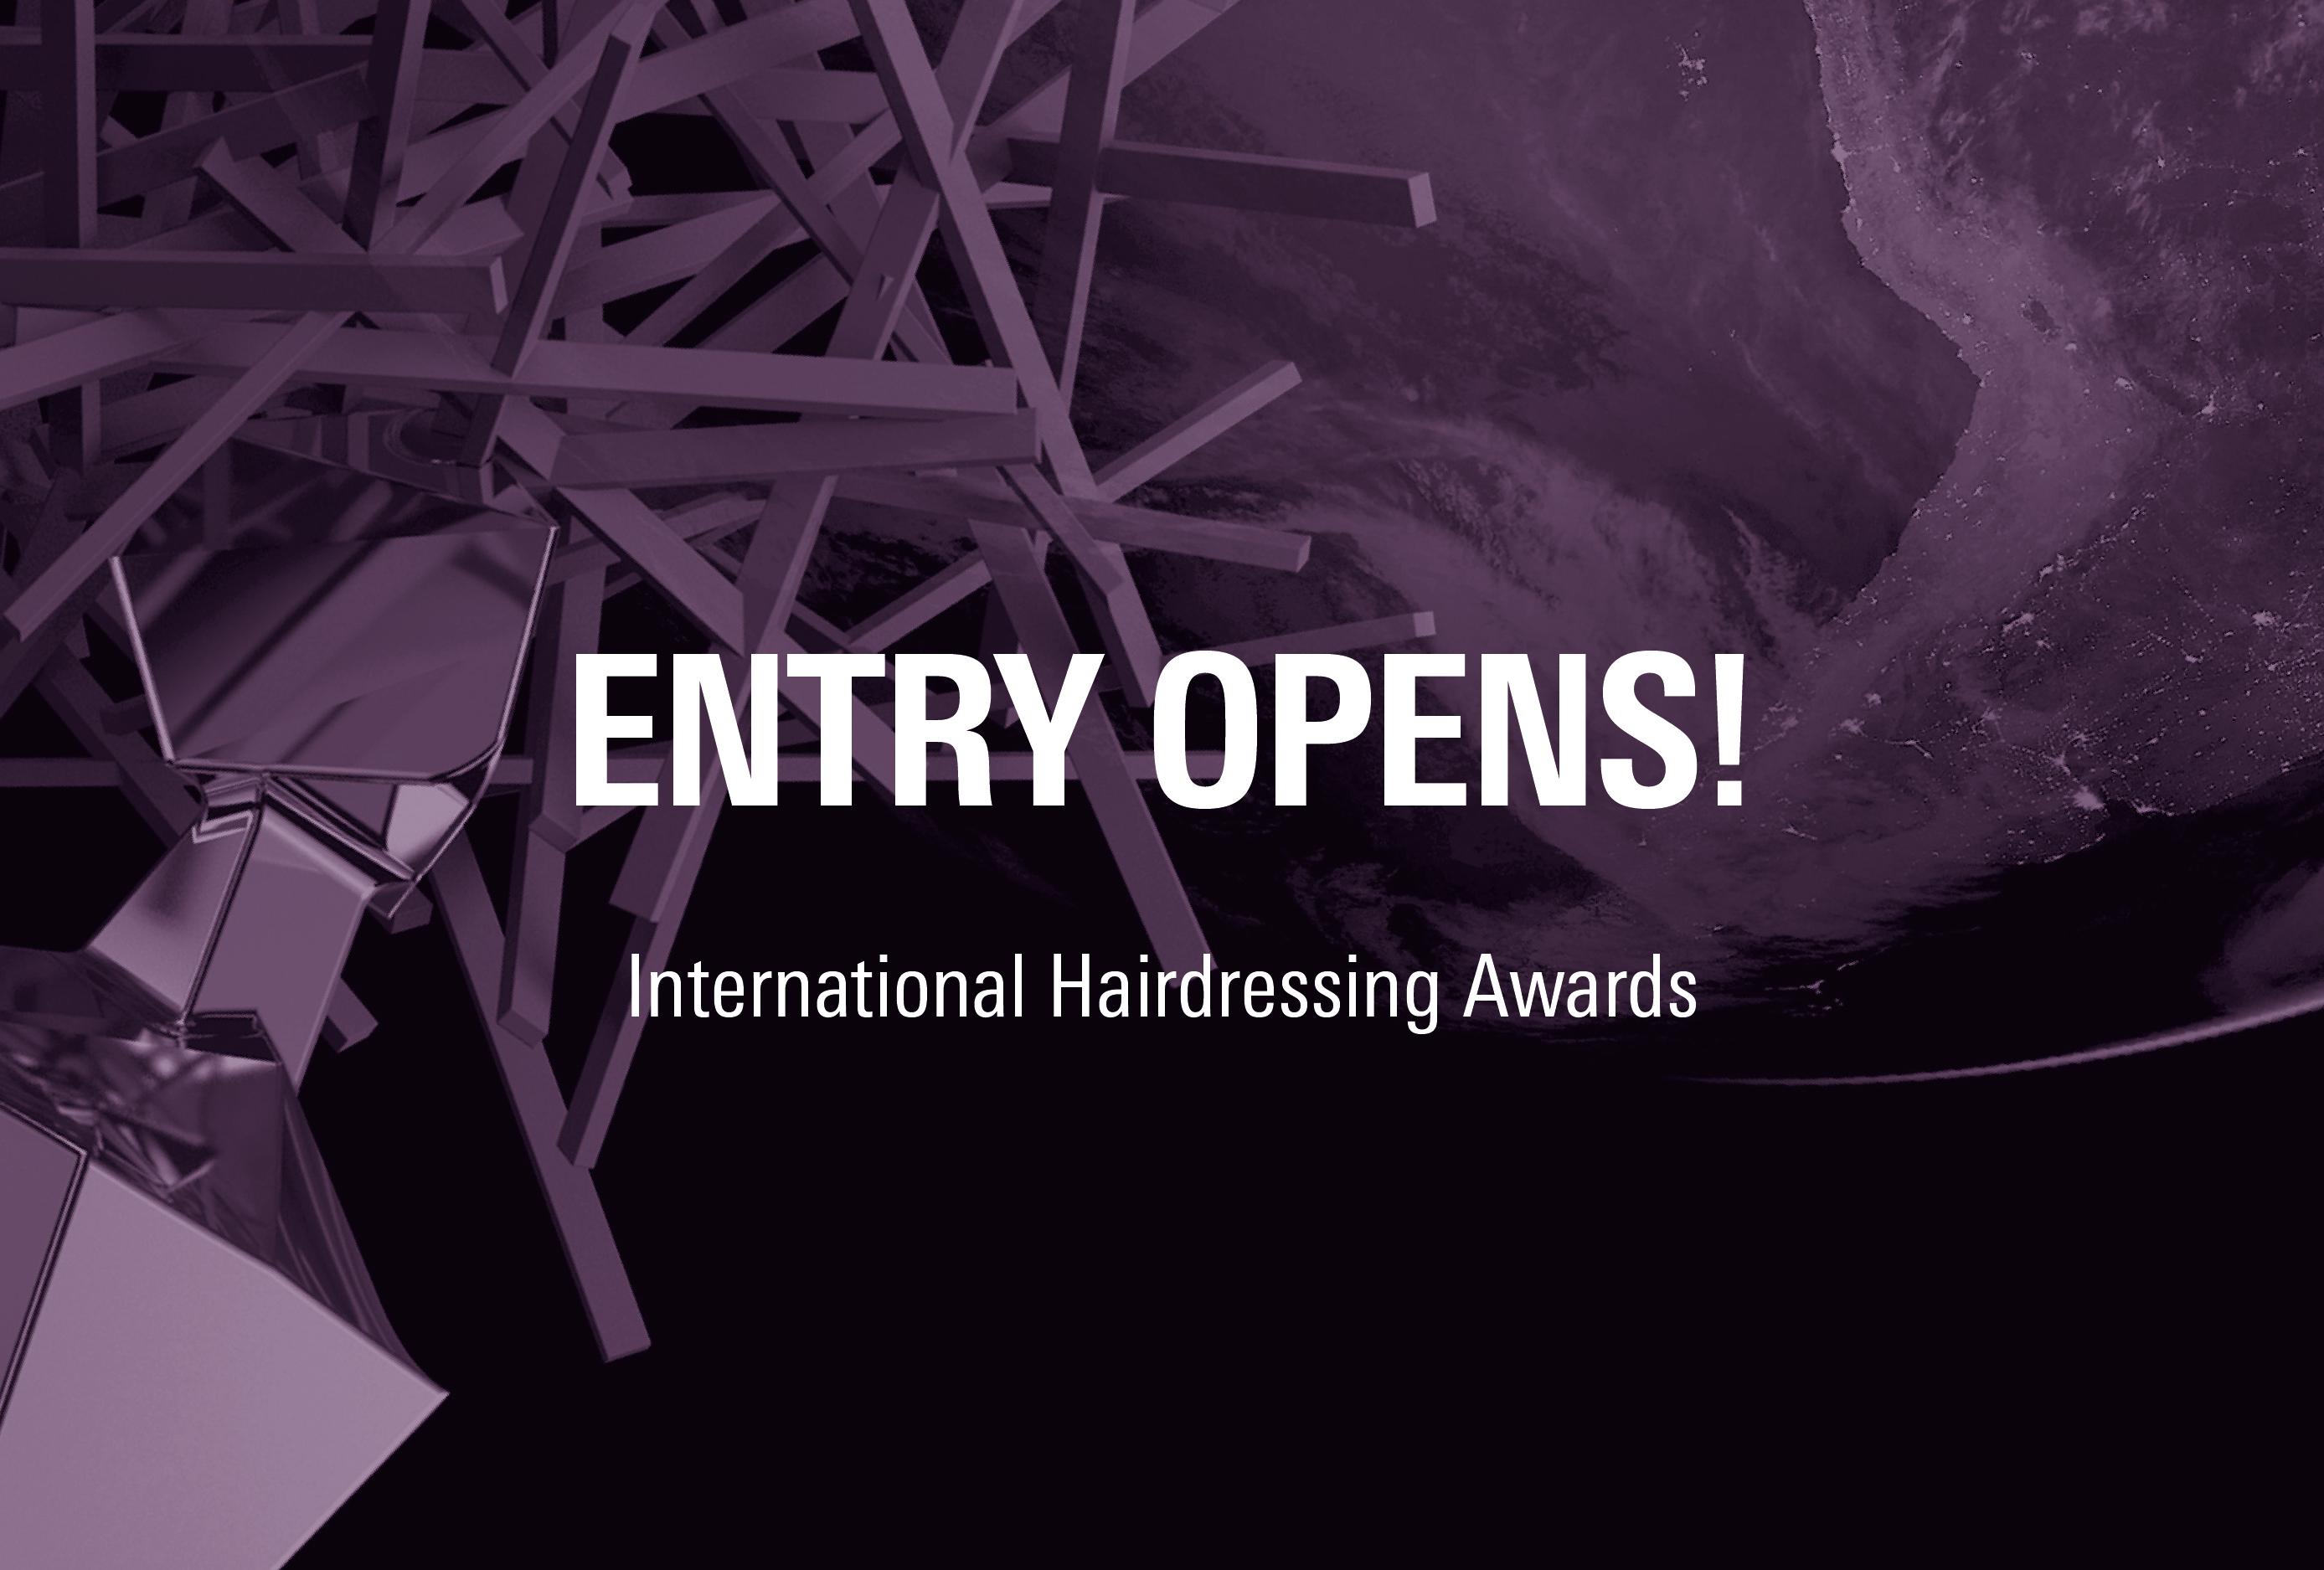 2021 International Hairdressing Awards: Entries open!